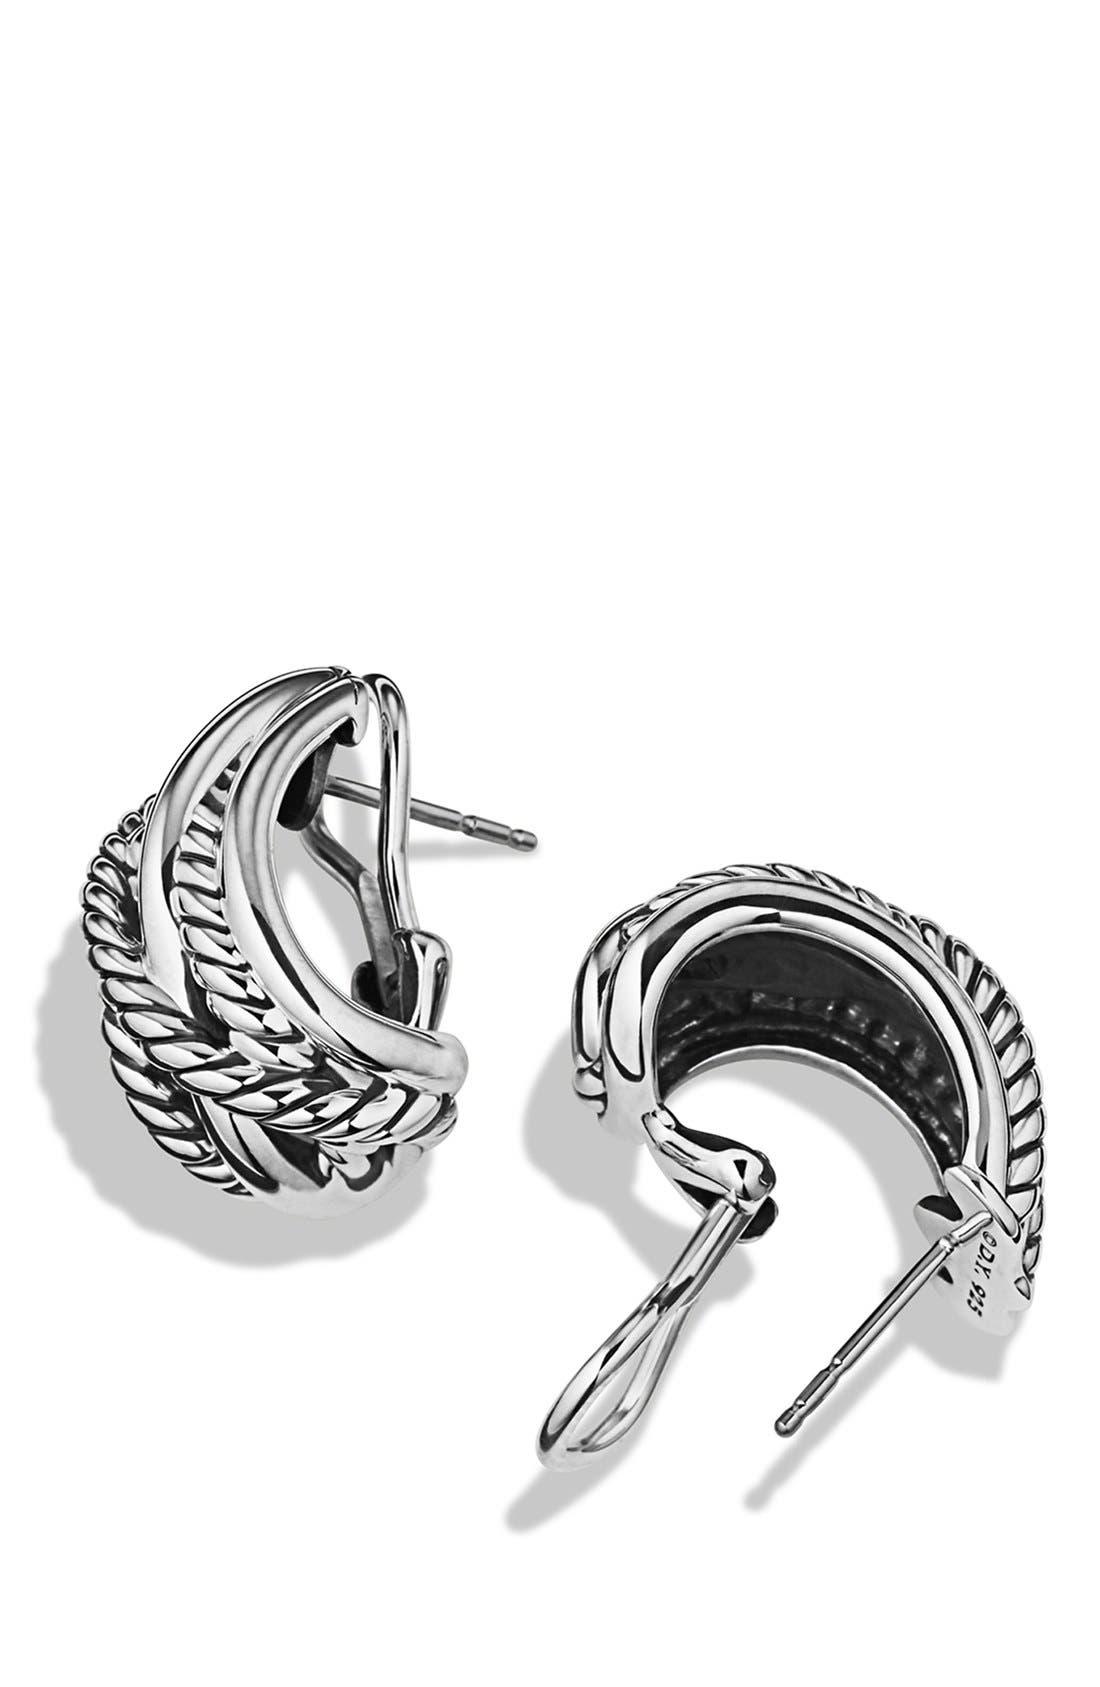 Alternate Image 2  - David Yurman 'Crossover' Earrings